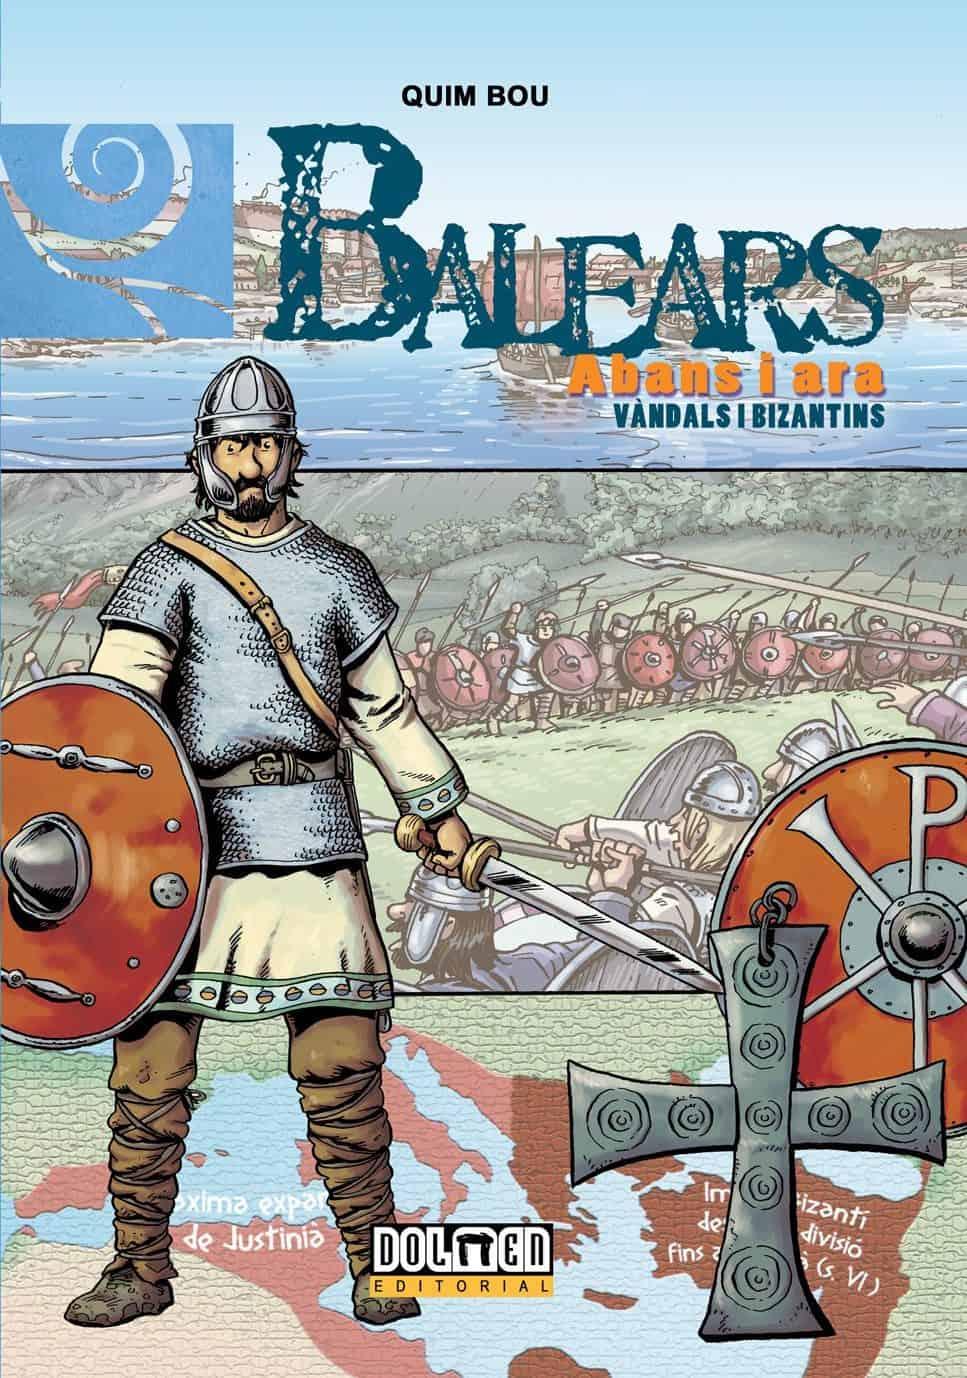 BALEARS ABANS I ARA 05: VANDALS I BIZANTINS (CATALAN)